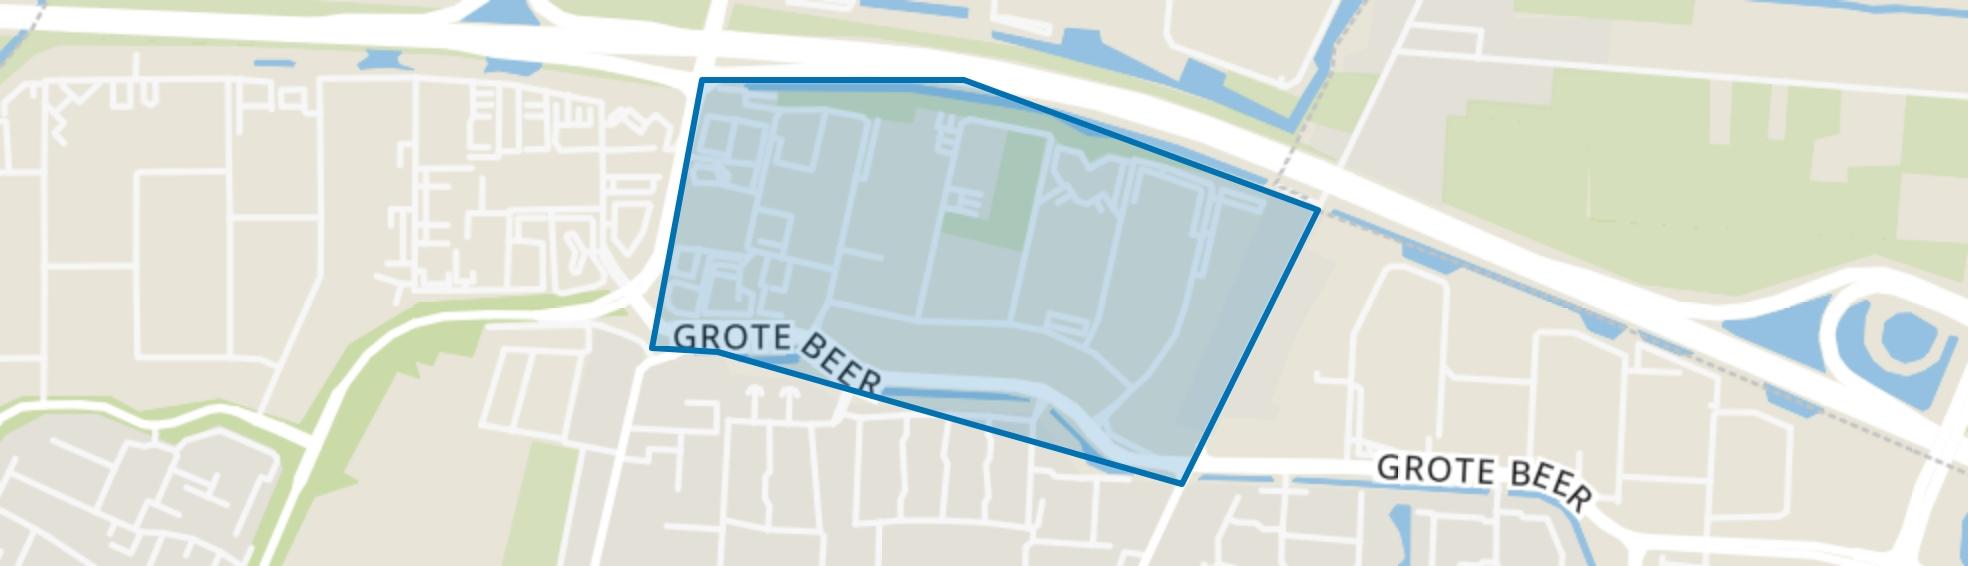 De Compagnie, Veenendaal map